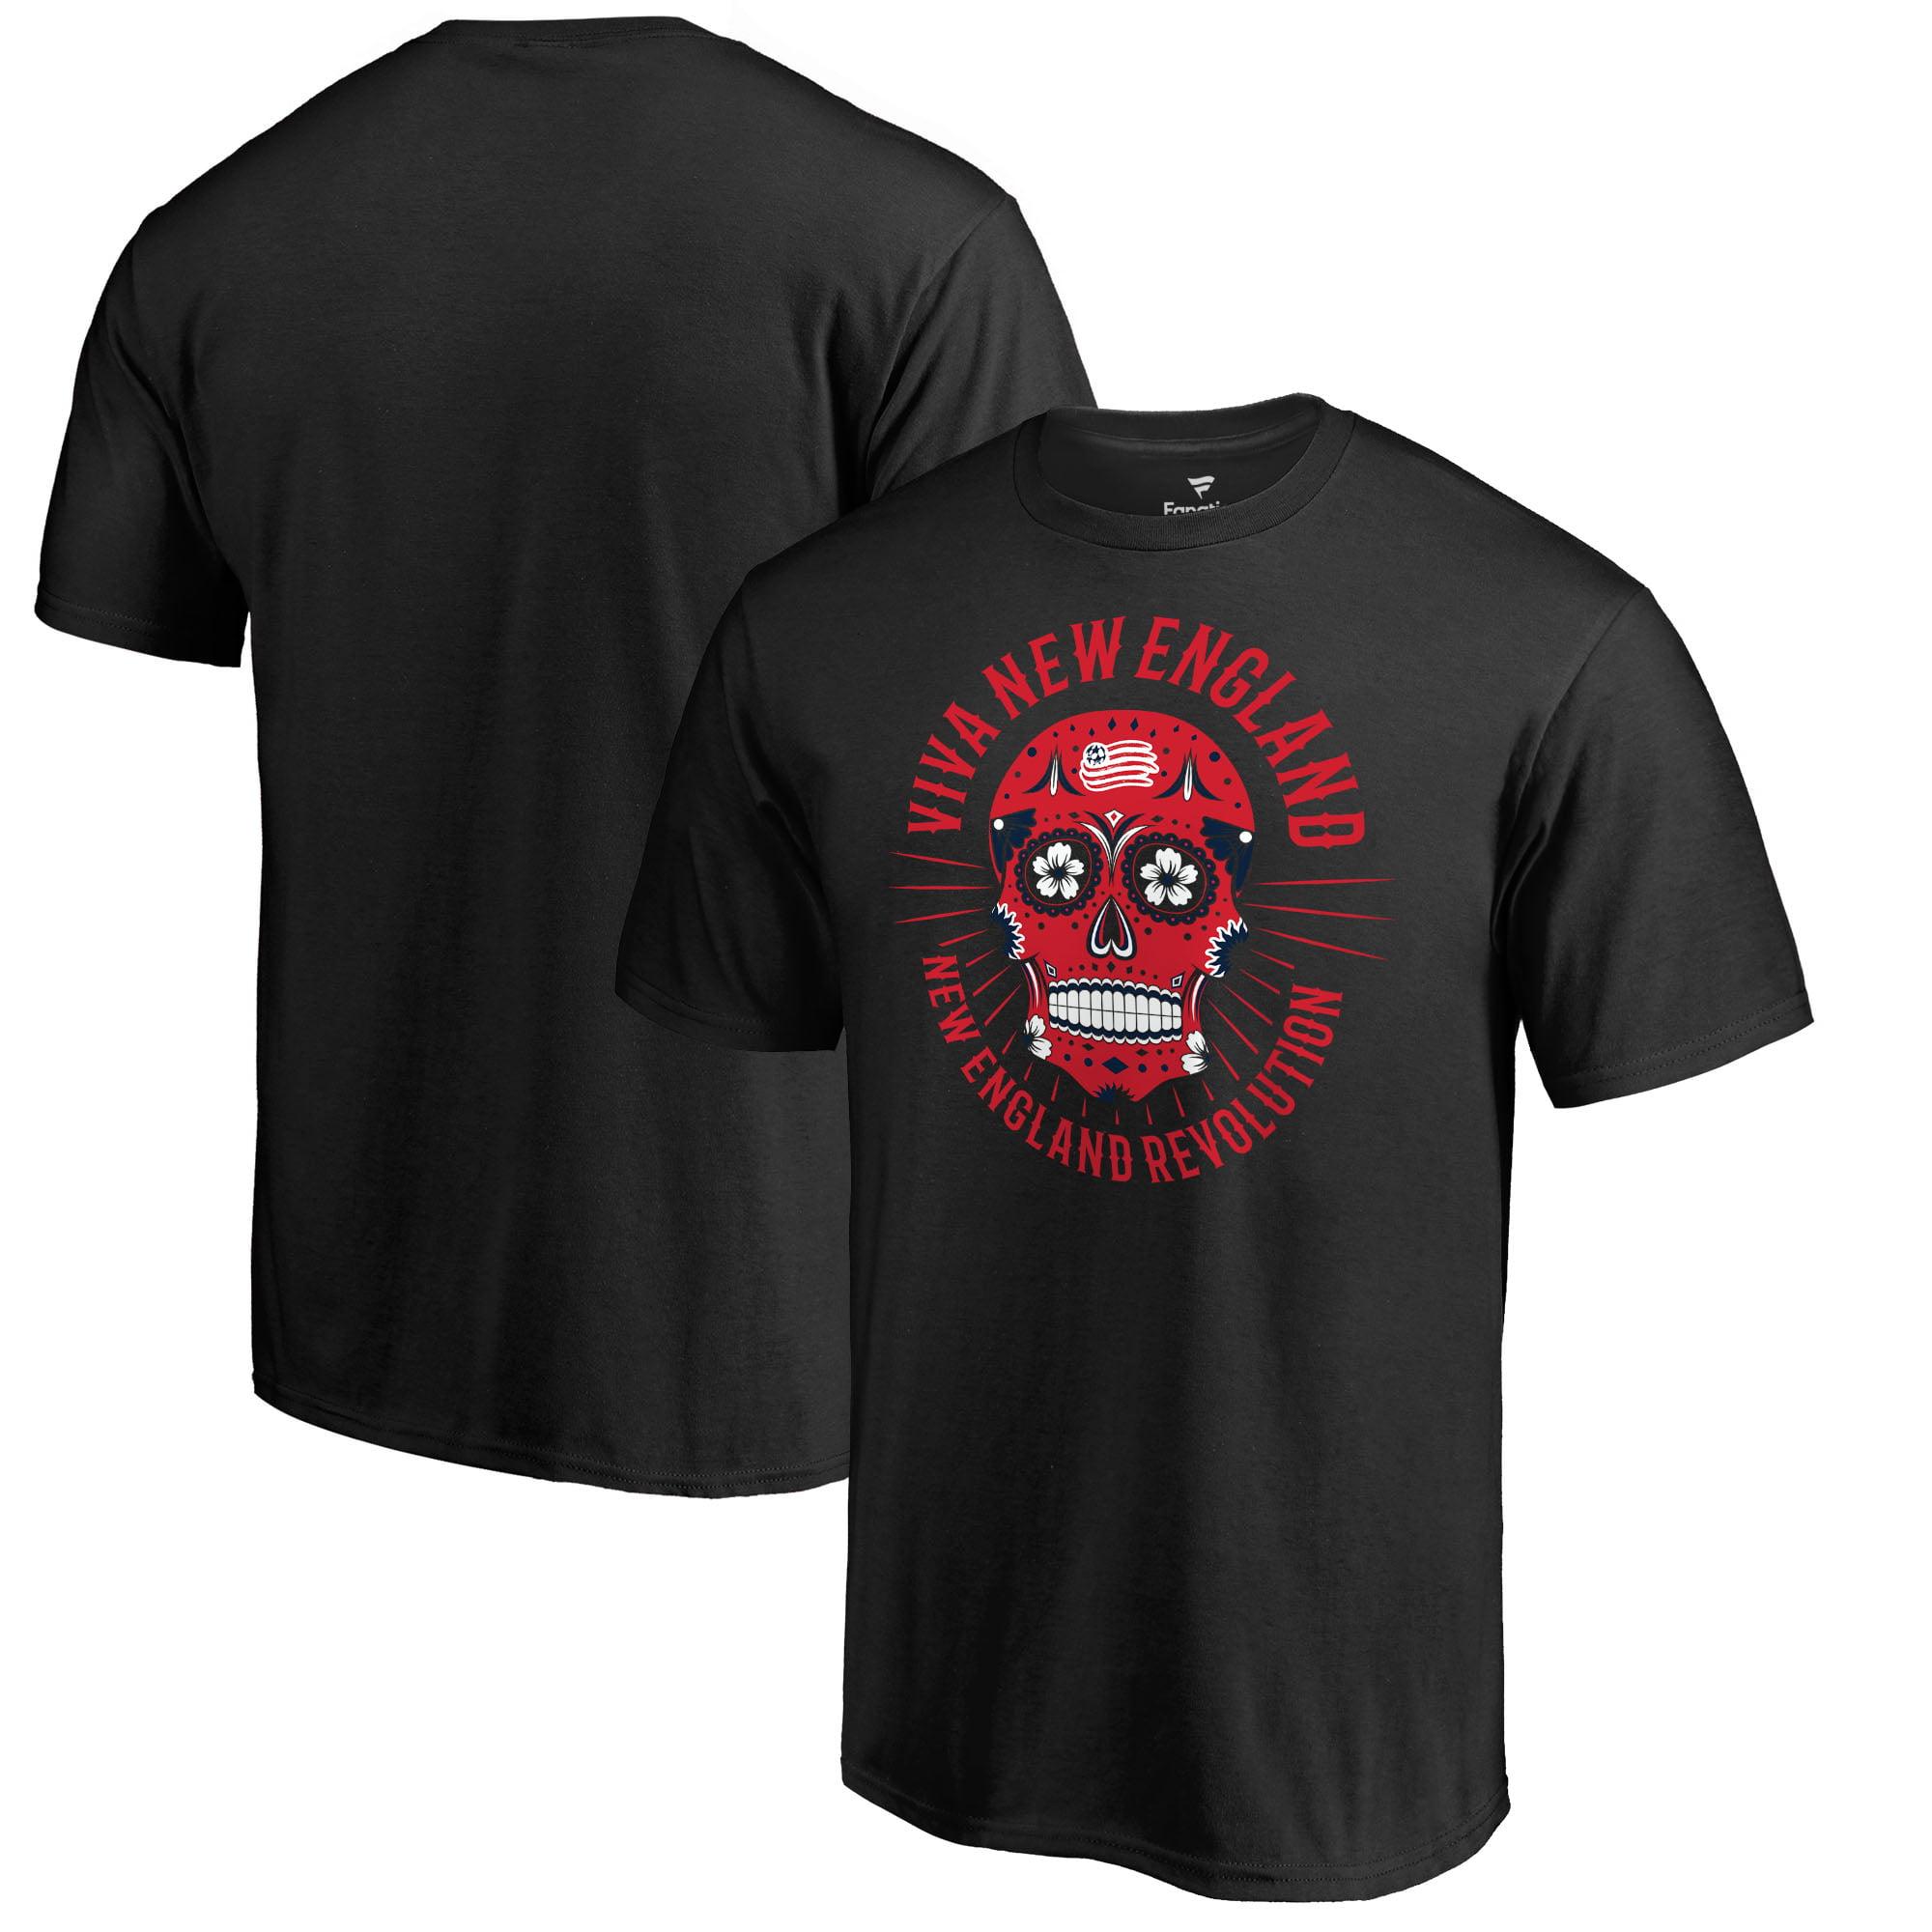 New England Revolution Fanatics Branded Hispanic Heritage Viva T-Shirt T-Shirt - Black